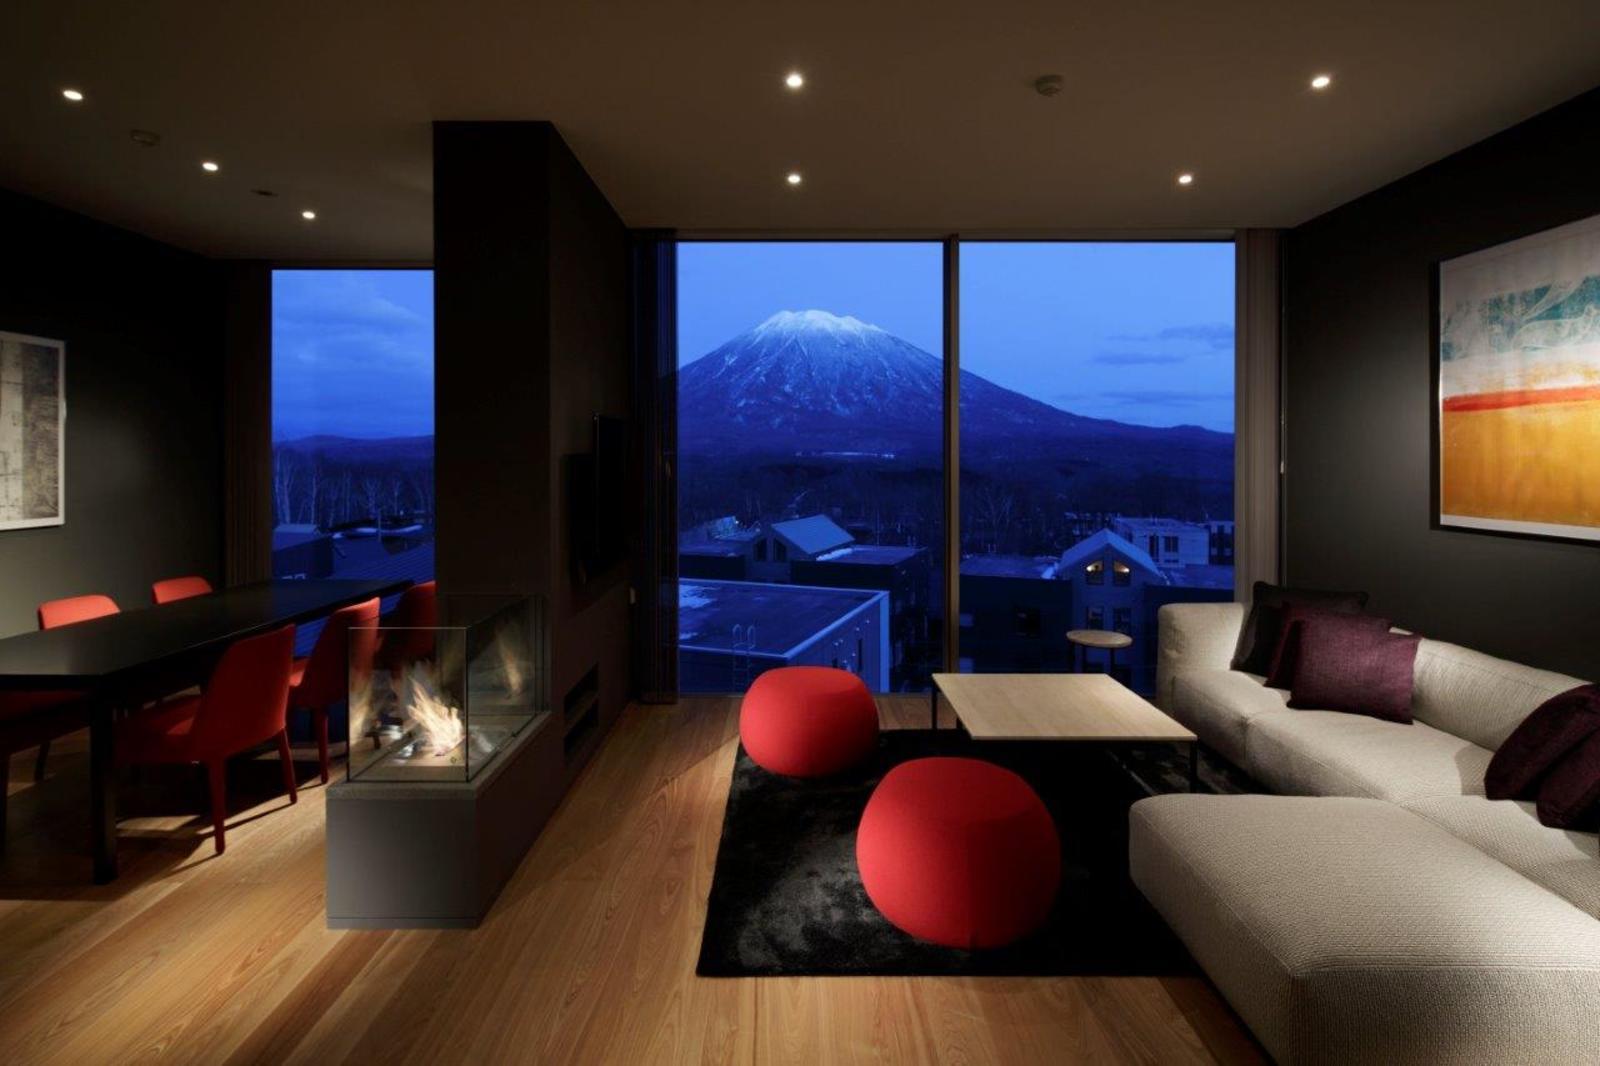 Terrazze 301 yotei living area night large